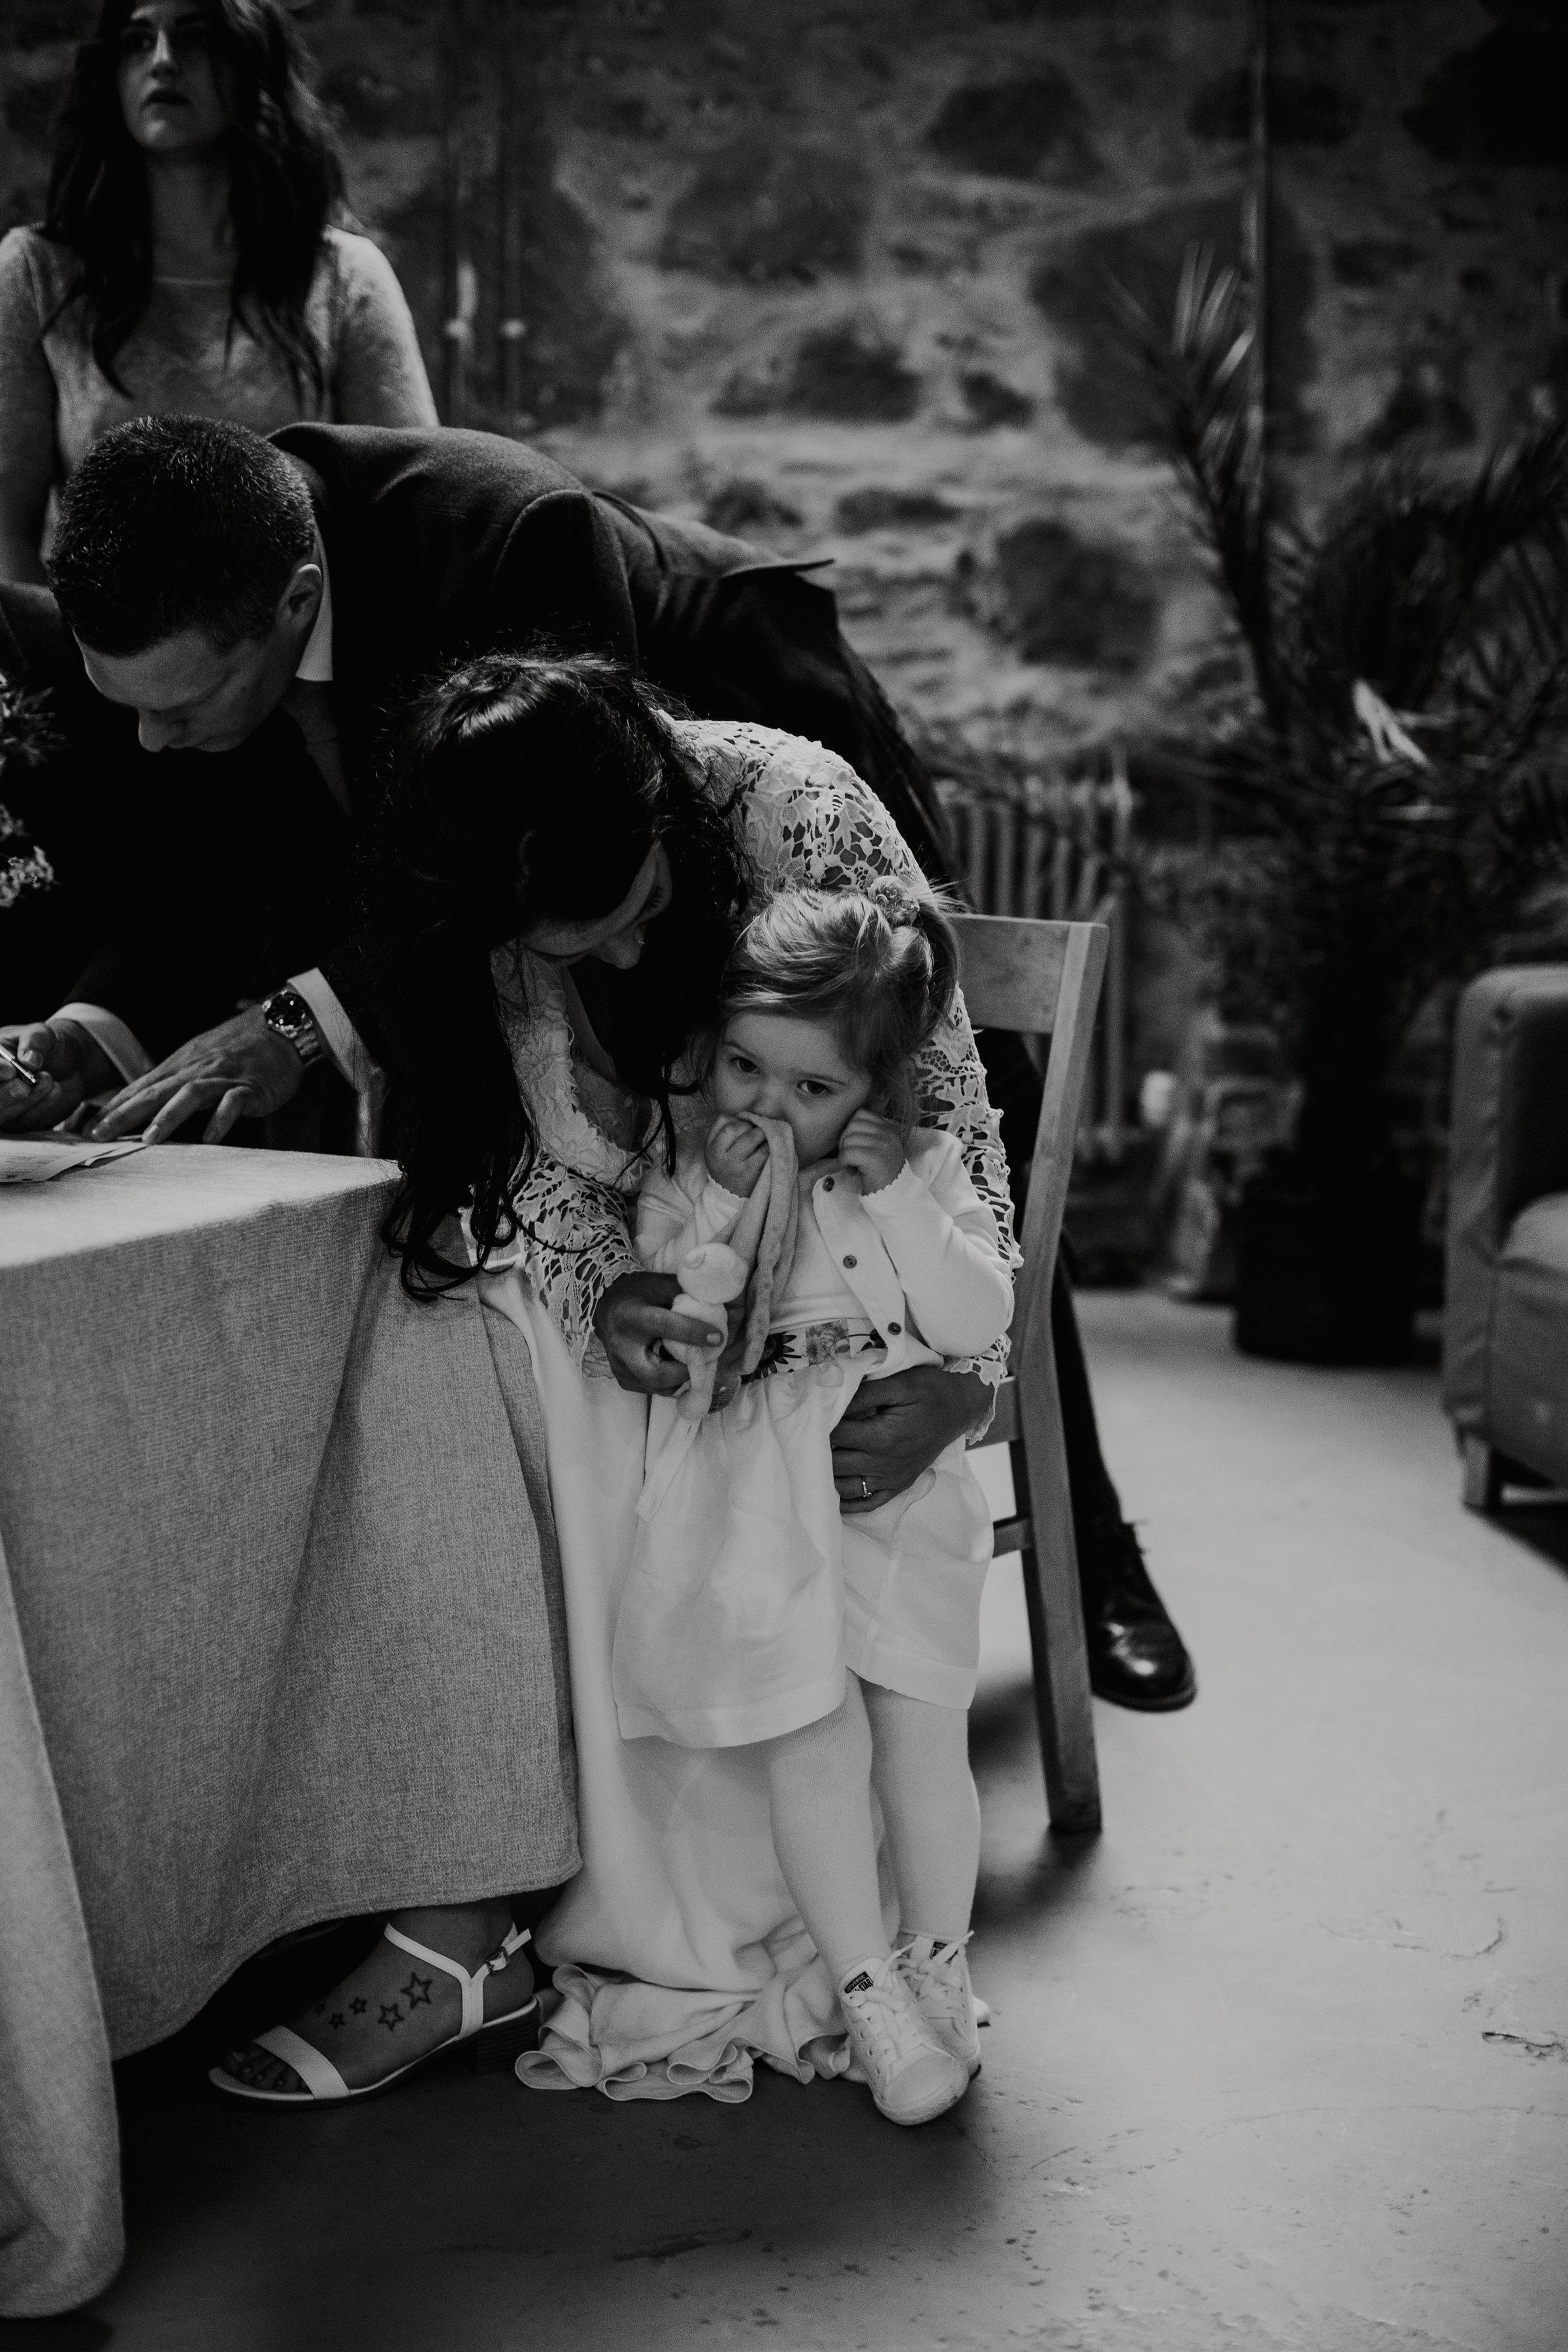 Katt-Scotland-Comrie-Crieff-Bias-Crepe-Wedding-Gown-Lace-Bridal-Biker-Jacket-Bespoke-Susanna-Greening-Derbyshire-13